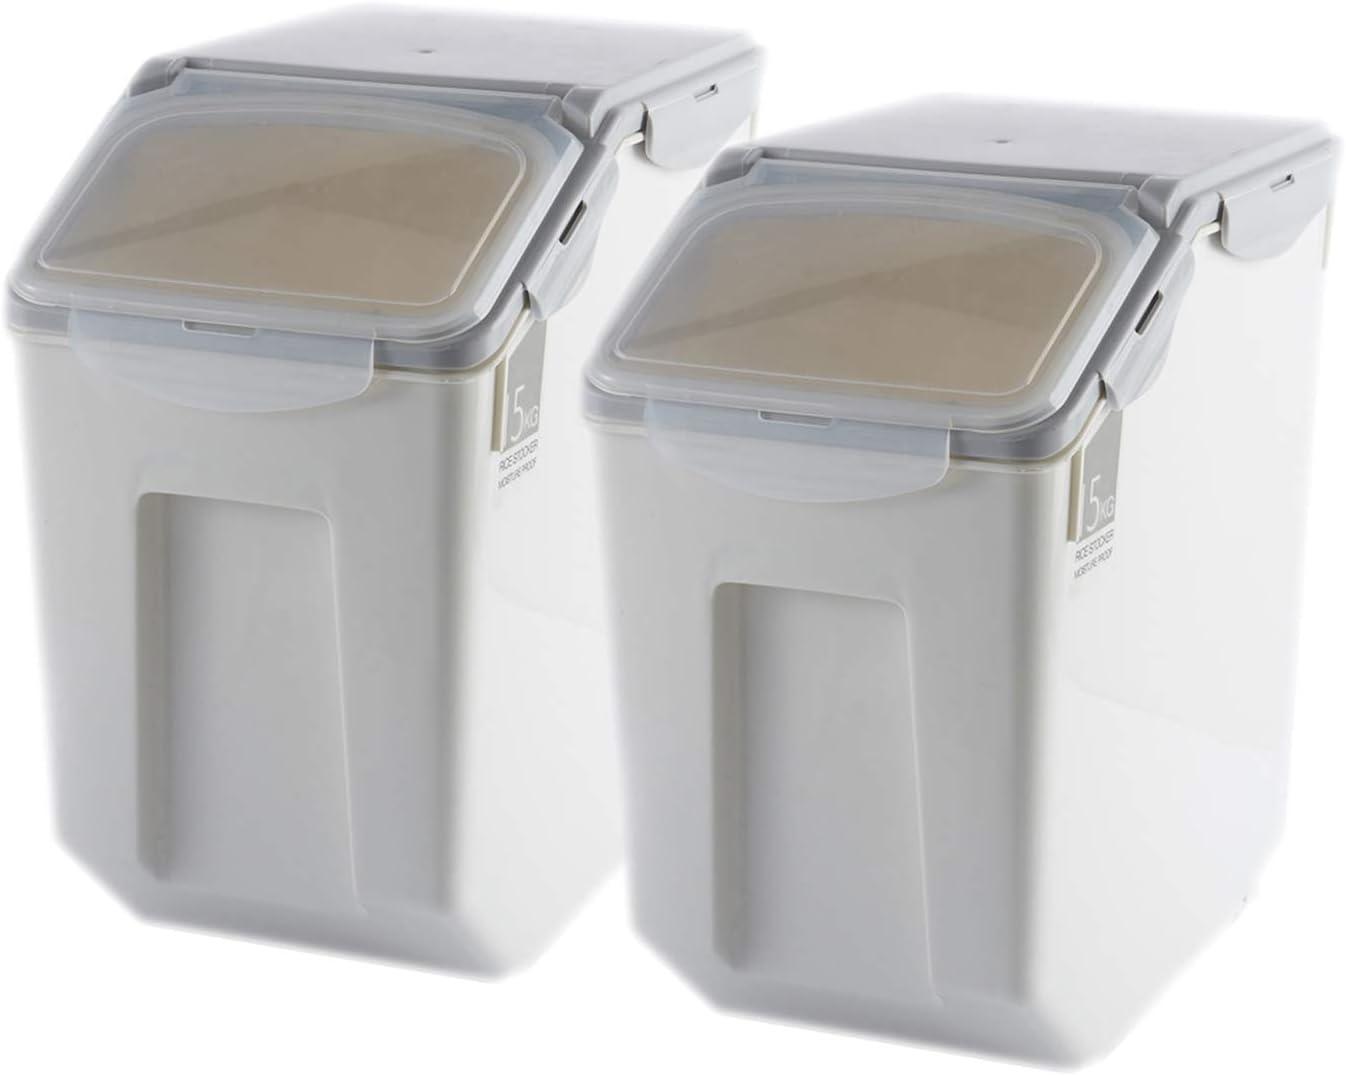 Grain Rice Storage Bin Food Containers Set Leak Proof Locking Lid, Large Storage Boxes Plastic Cereal Pet Food 15kg(18L), Grey,2packs